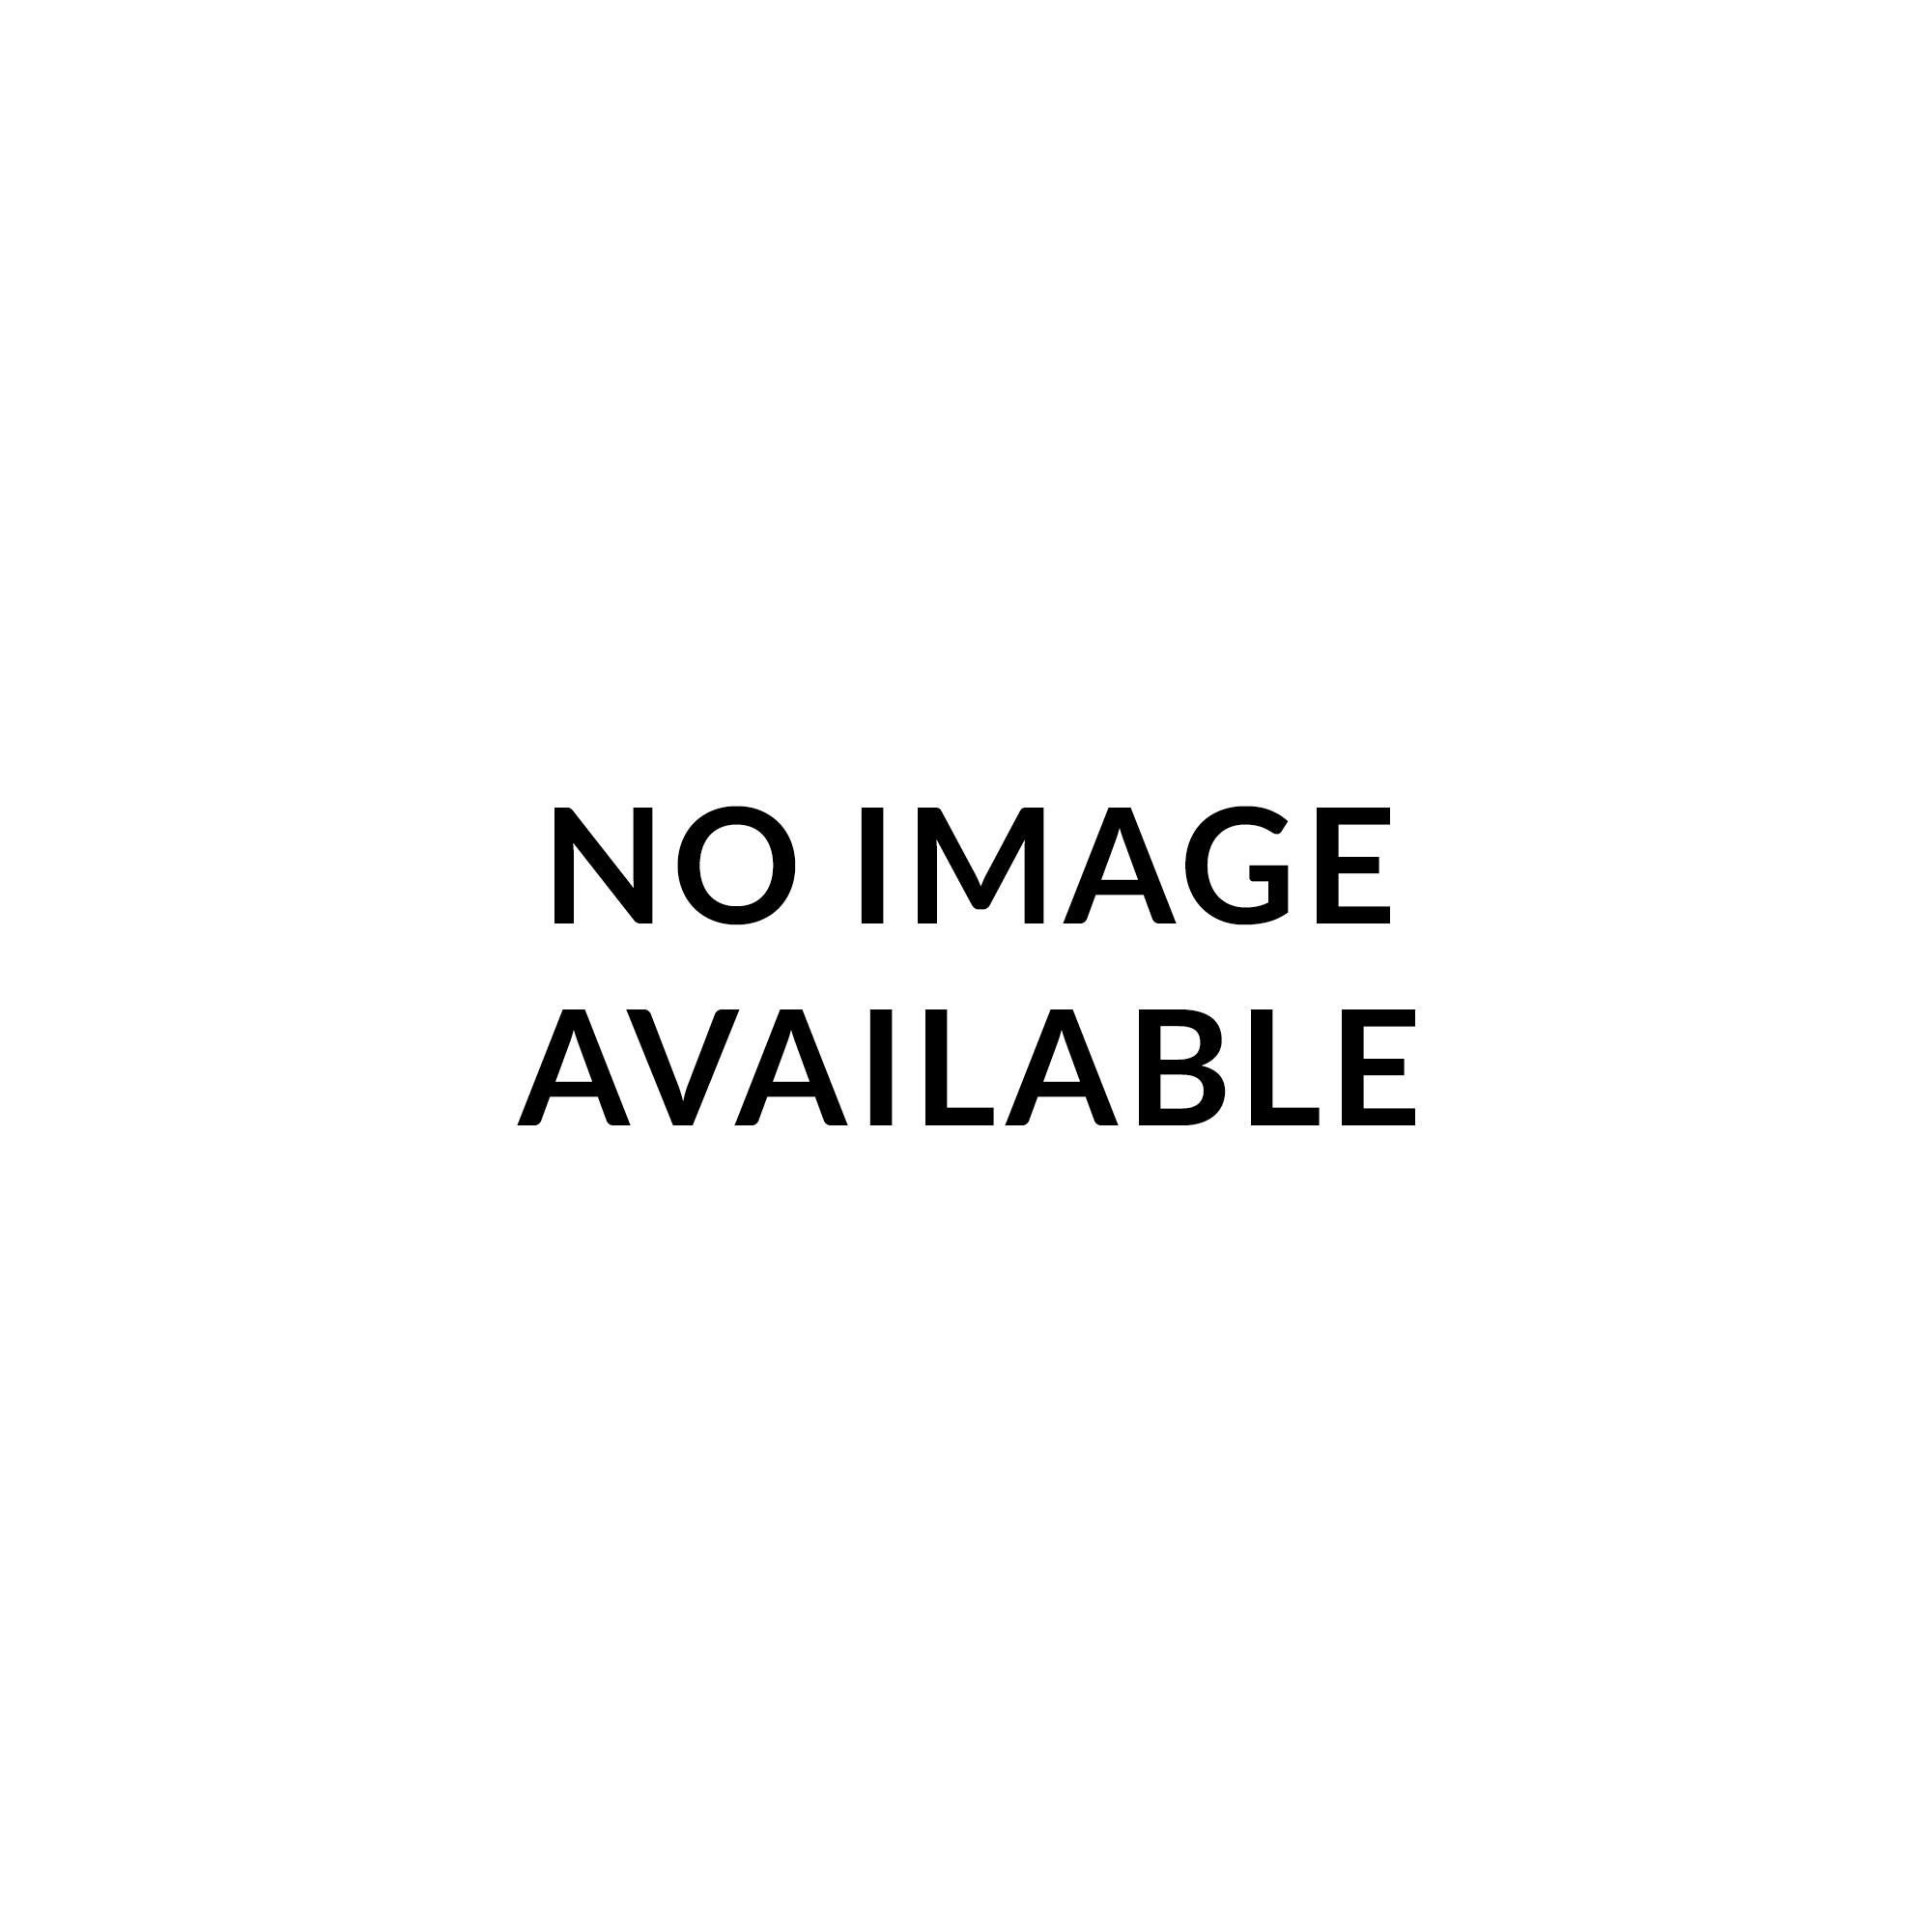 "Meinl Headliner Series Cajon 11 3/4"" x 18"" Natural Frontplate"